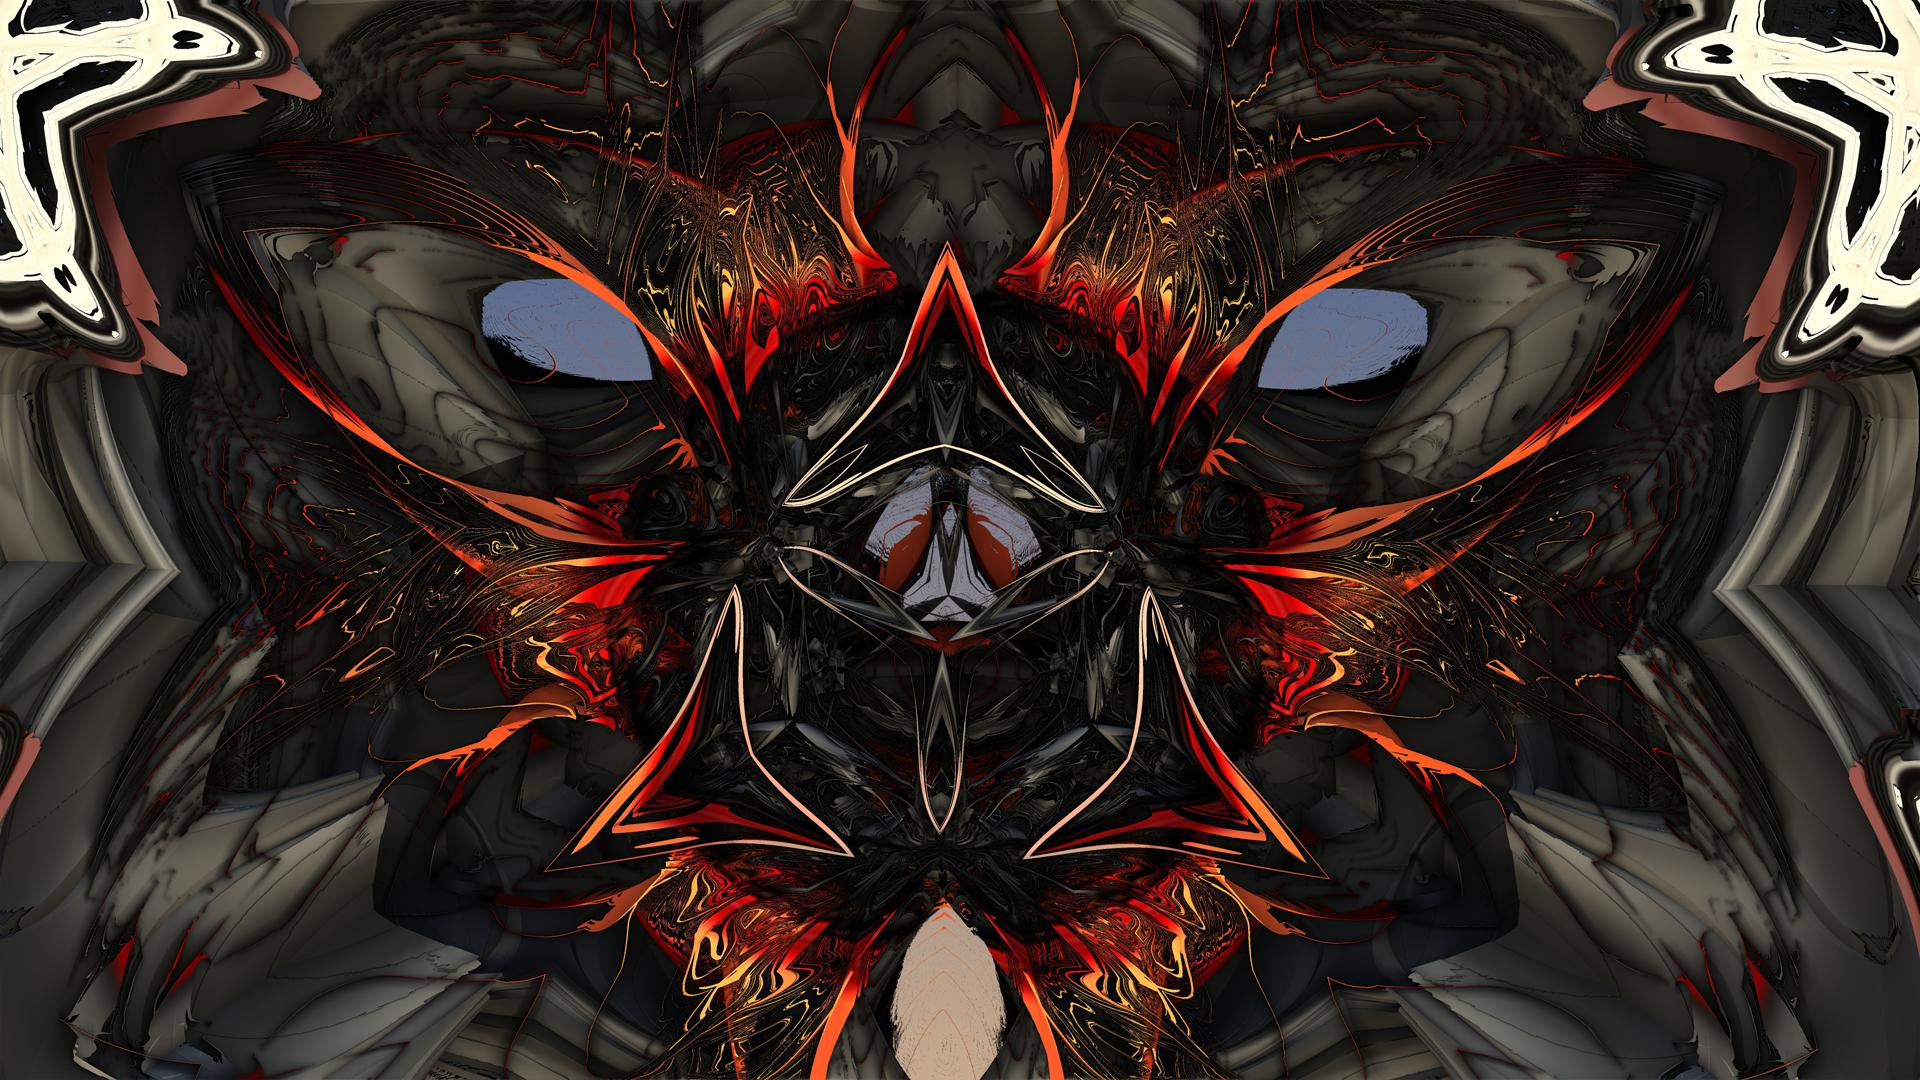 MB3D Fireemblem by viperv6